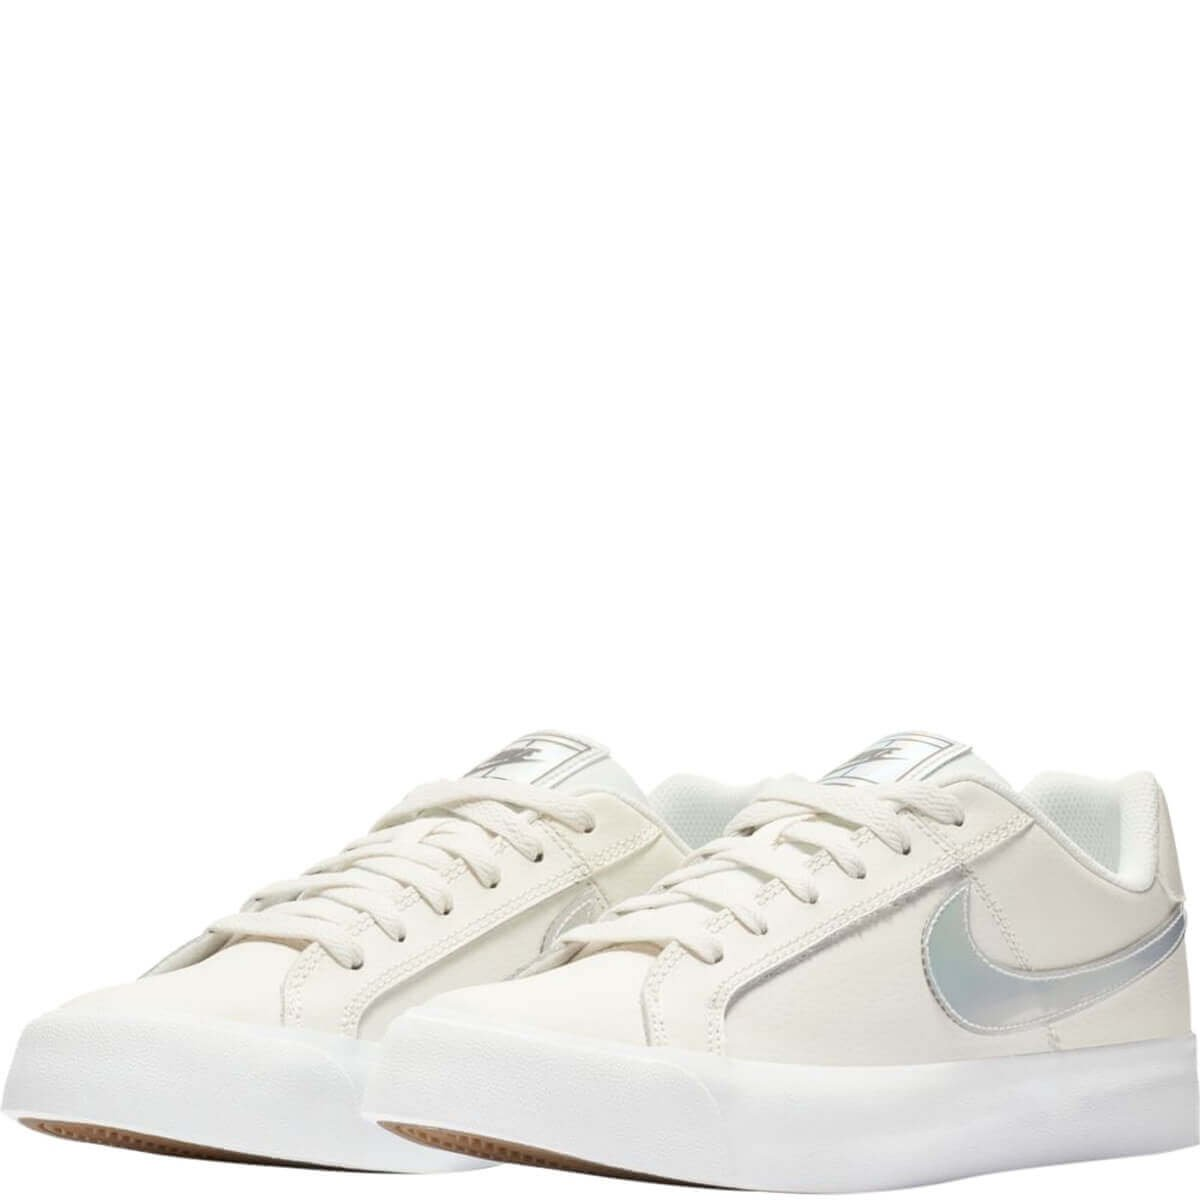 7d1c7a333 Bizz Store - Tênis Feminino Nike Court Royale